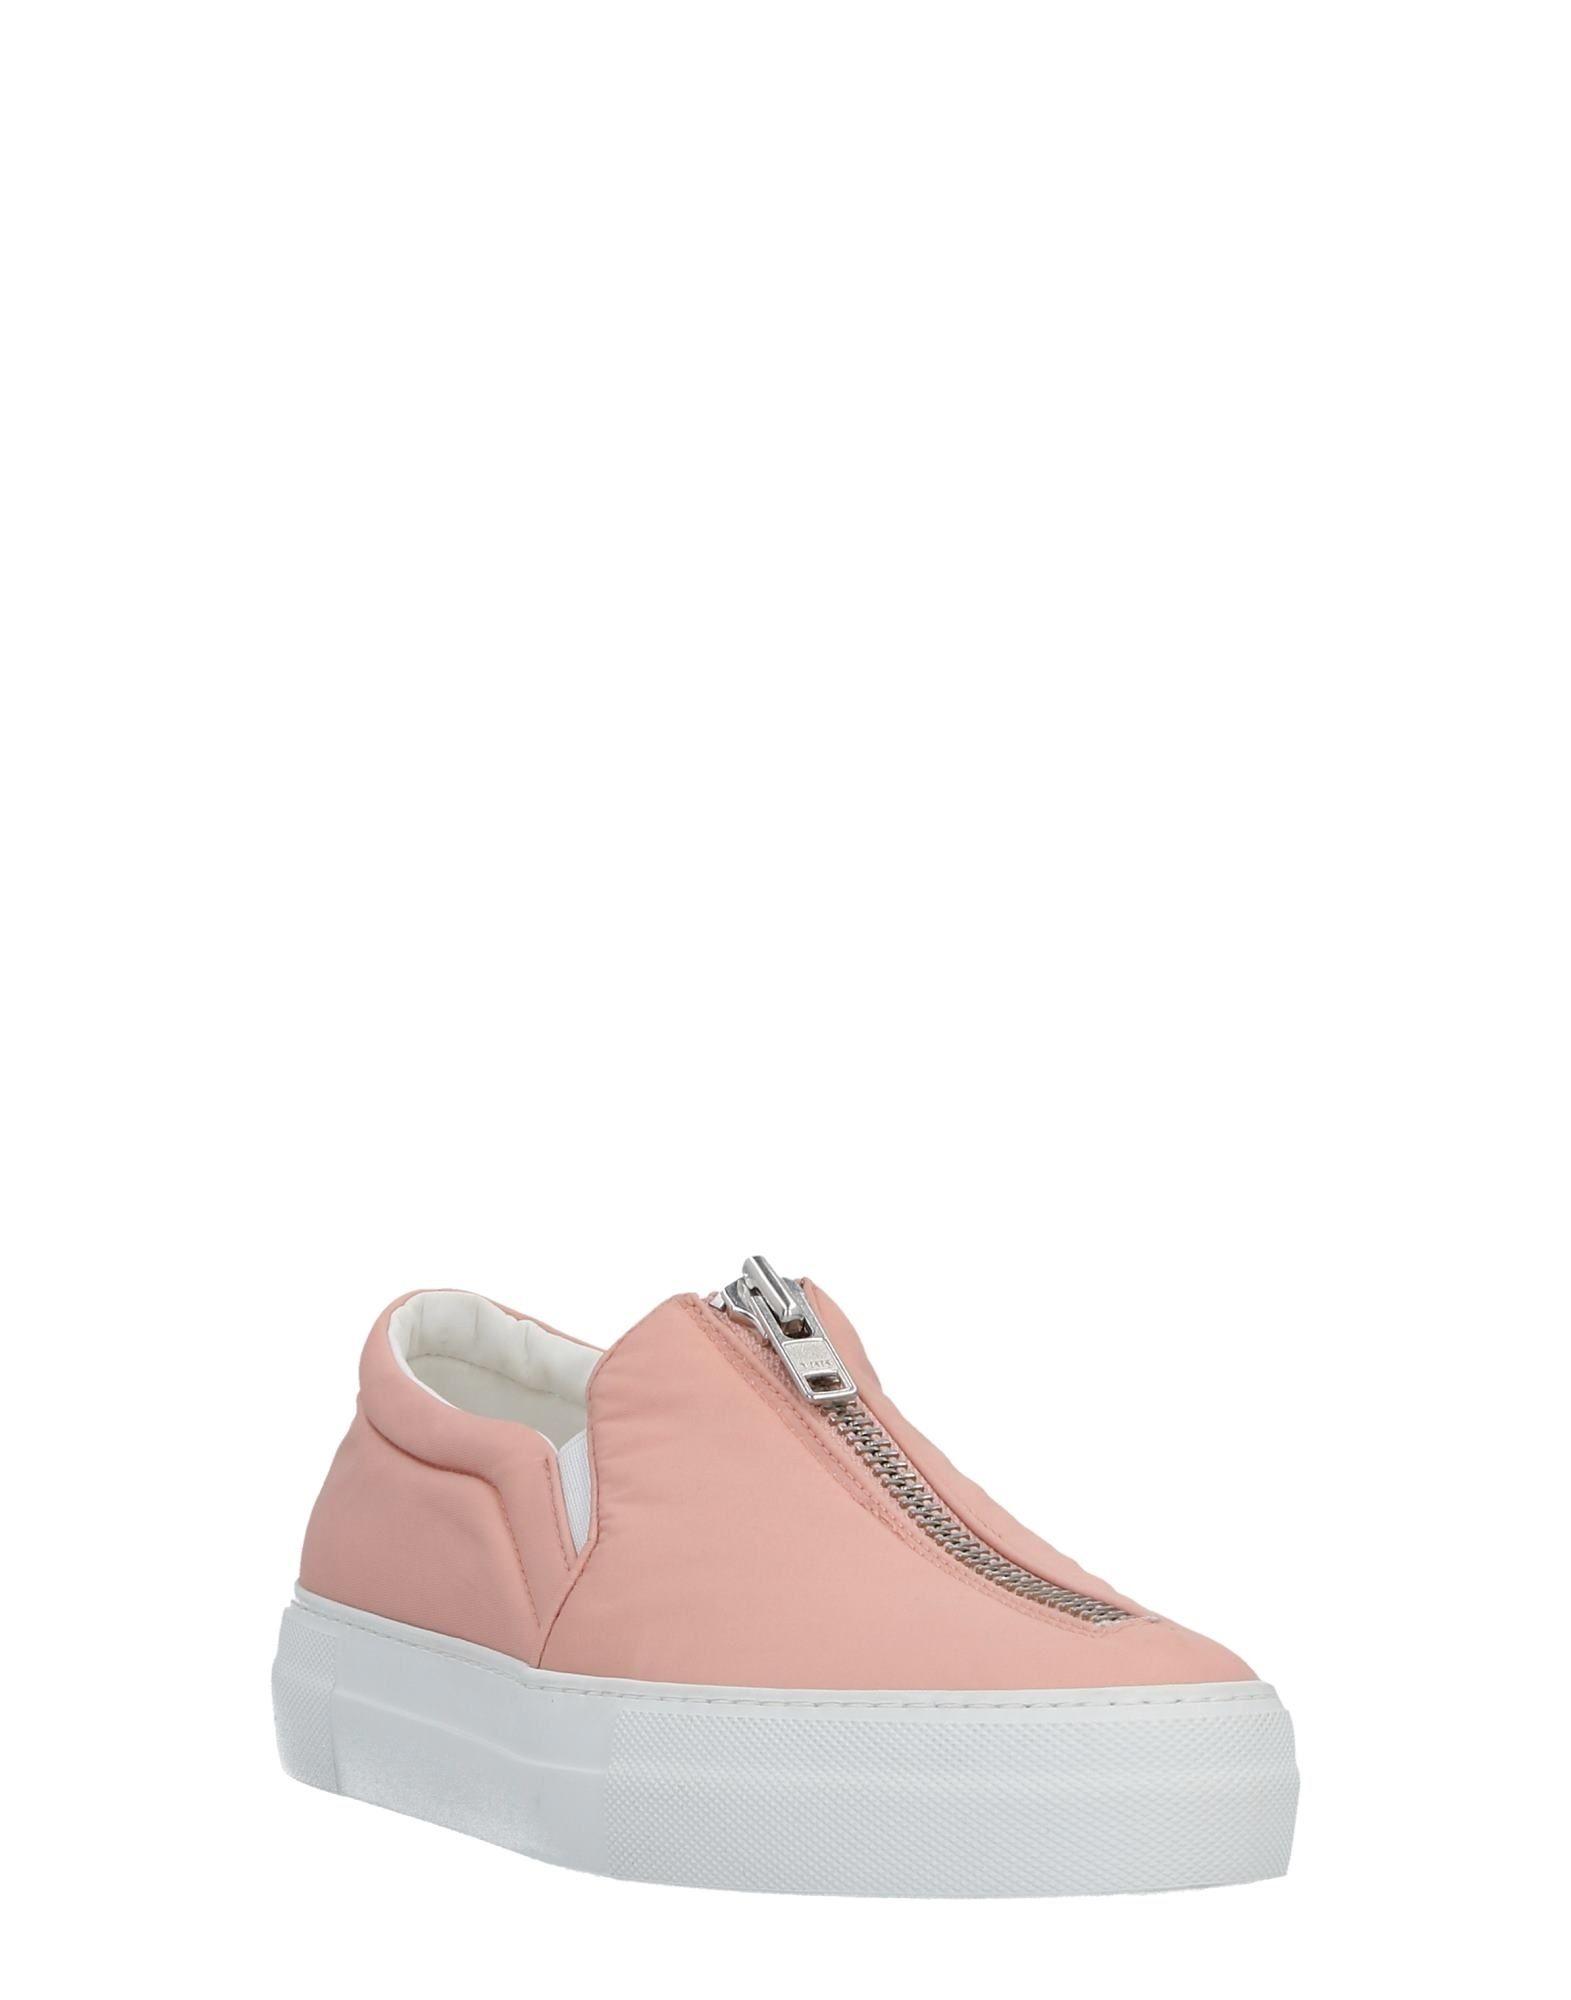 Joshua*S Sneakers Damen Damen Sneakers  11509426UC 4caba8